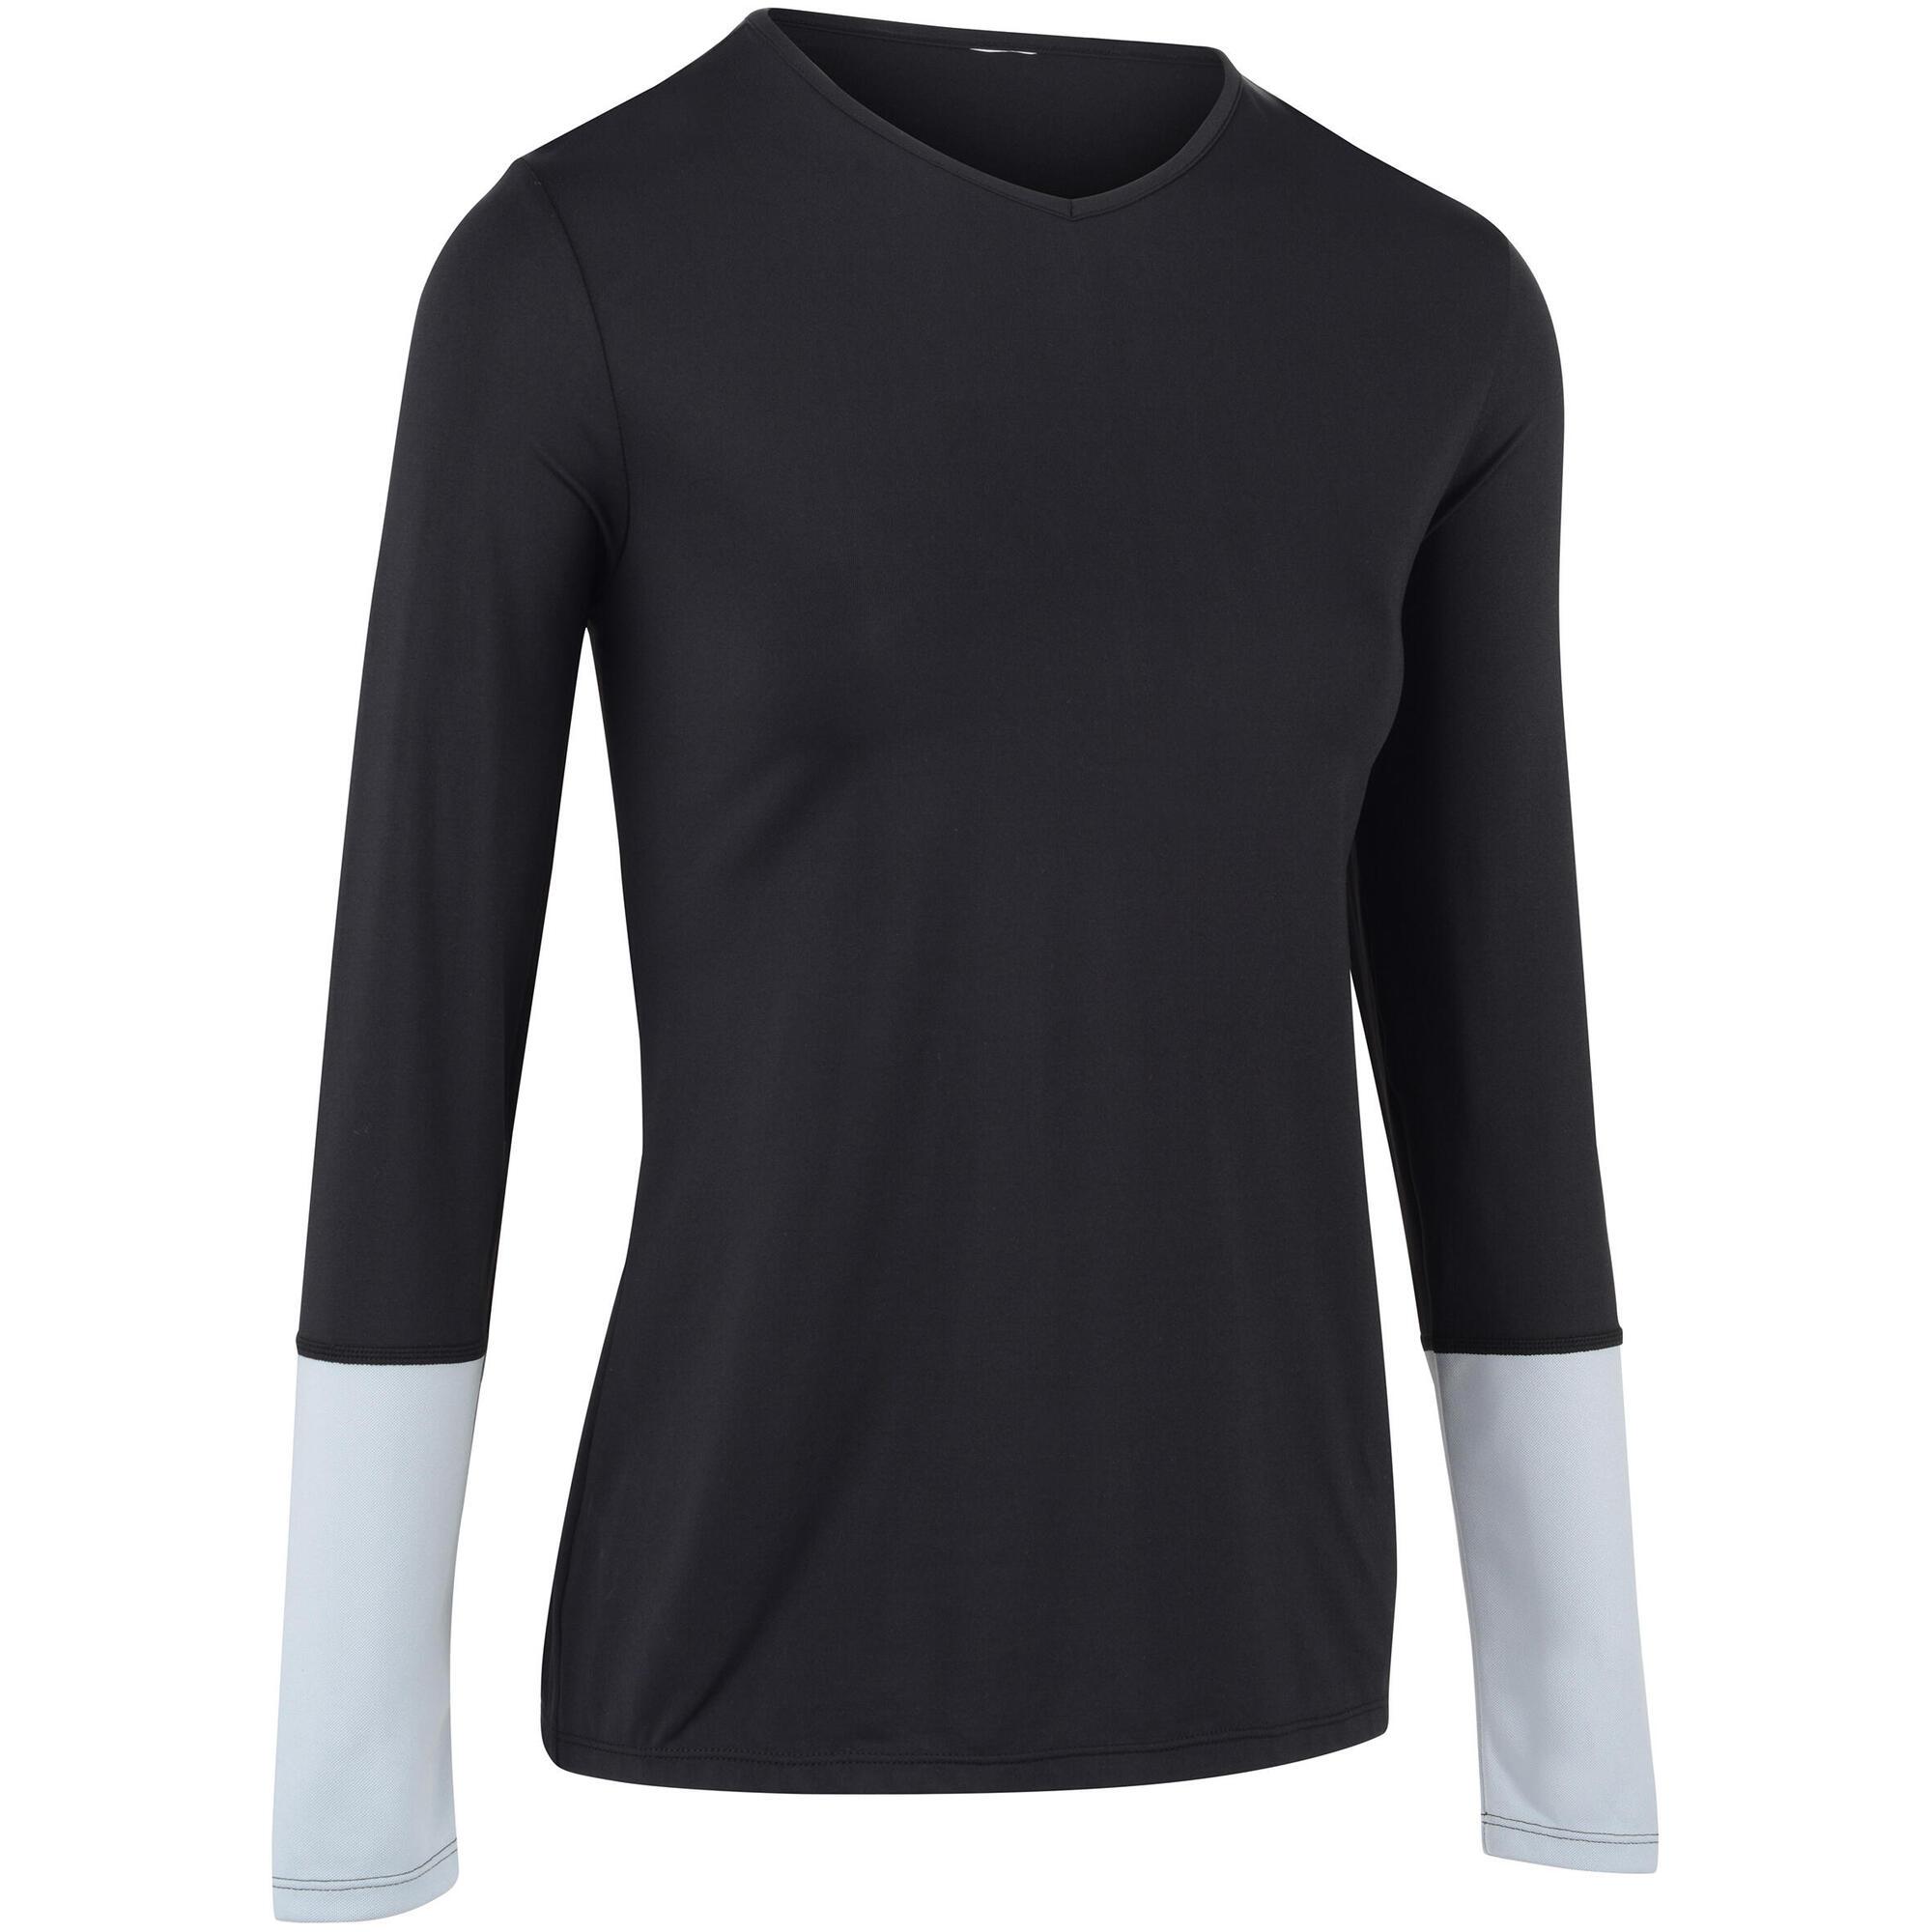 Essential Tennis Nero GrigioArtengo Donna Shirt T u3lcTFK1J